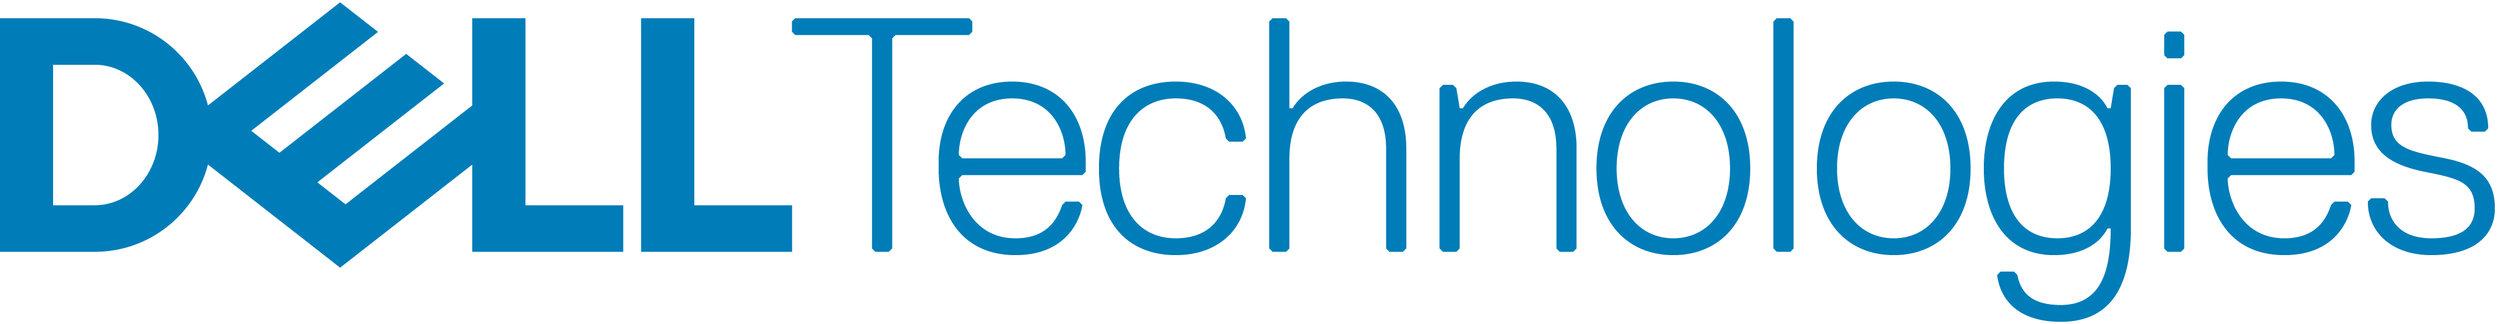 DellTech_Logo_Prm_Blue.jpg